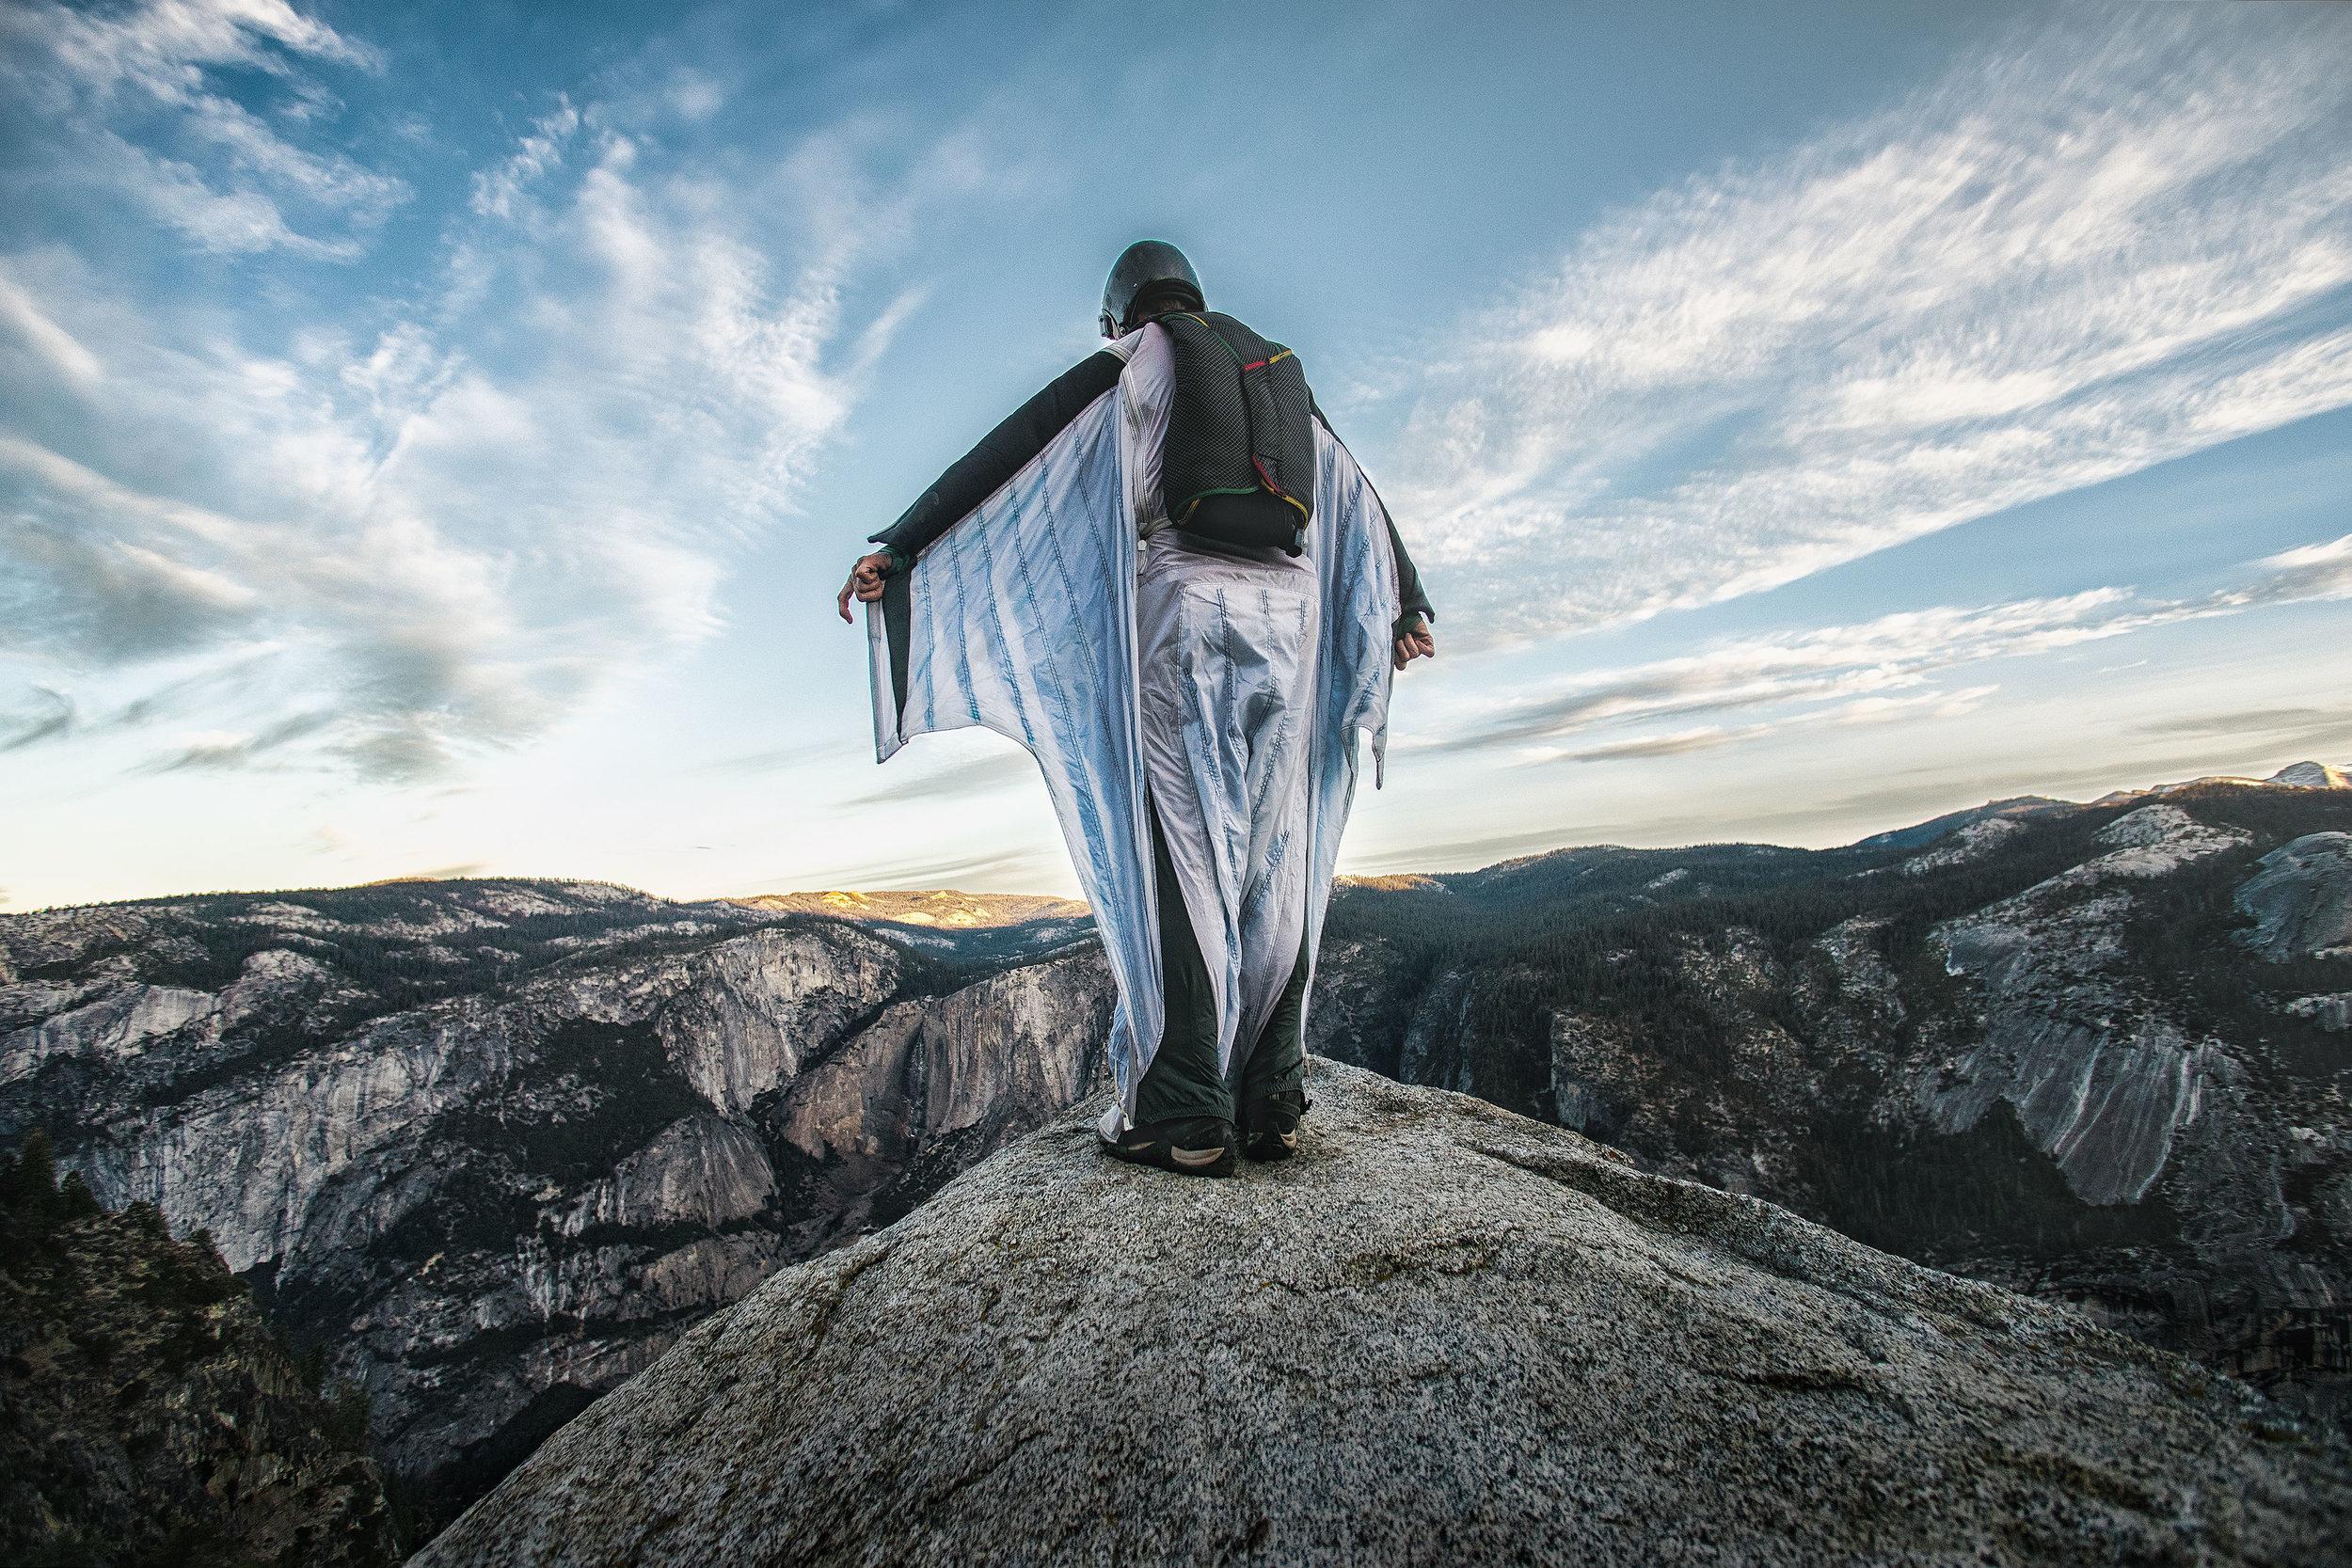 austin-trigg-wing-suit-base-jump-fly-yosemite-lifestyle-california-adventure-thrill-seeking-glacier-point-morning-sunrise.jpg